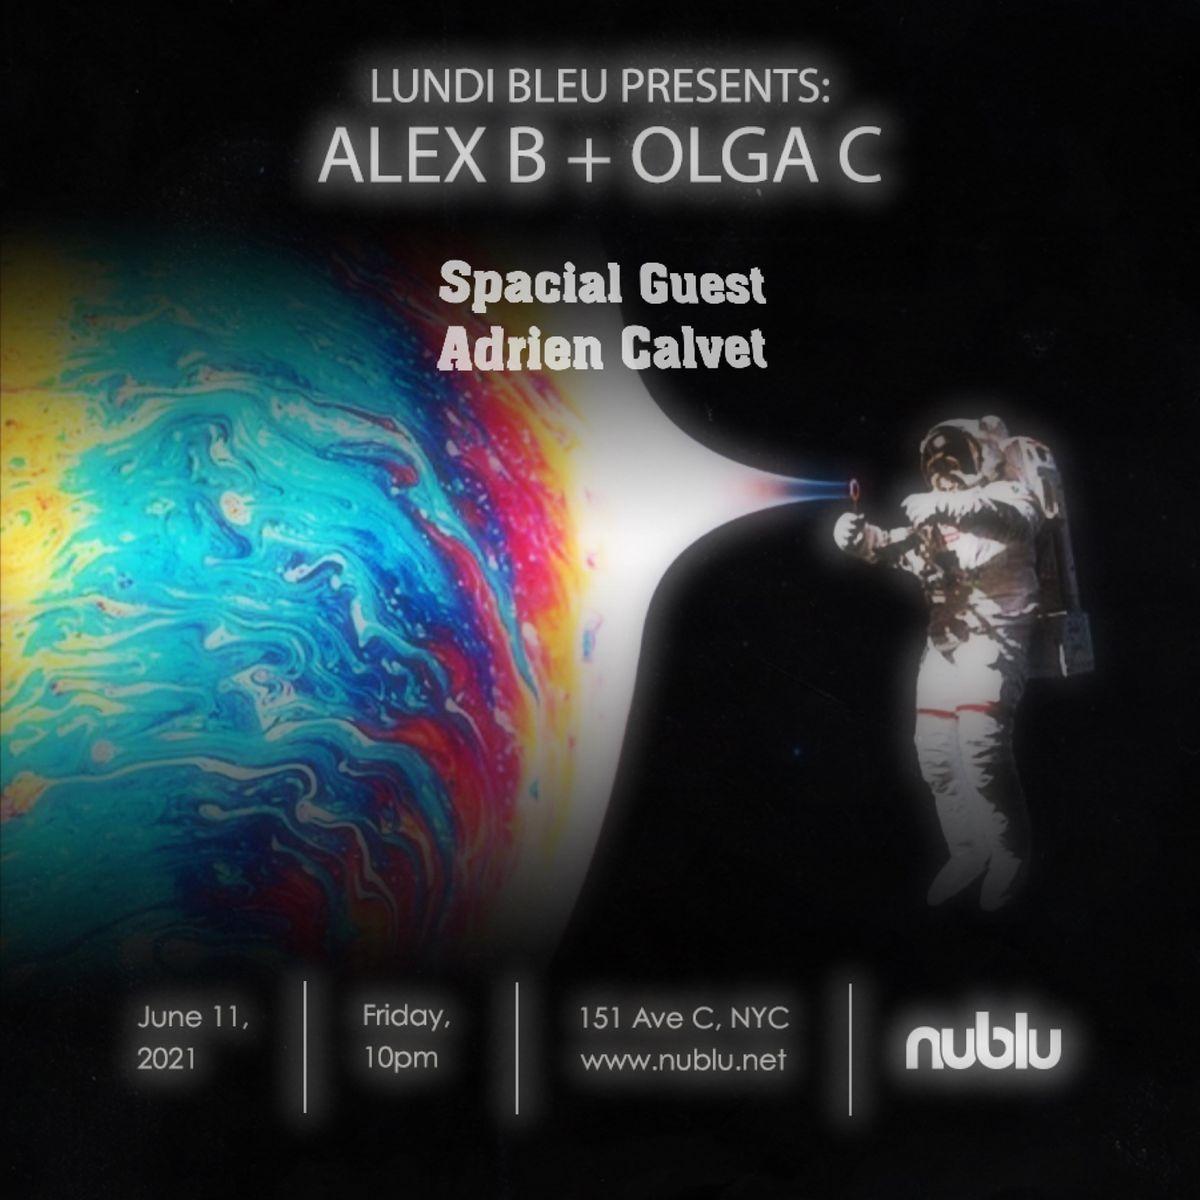 Lundi bleu DJset: Adrien Calvet x Alex B x Olga C